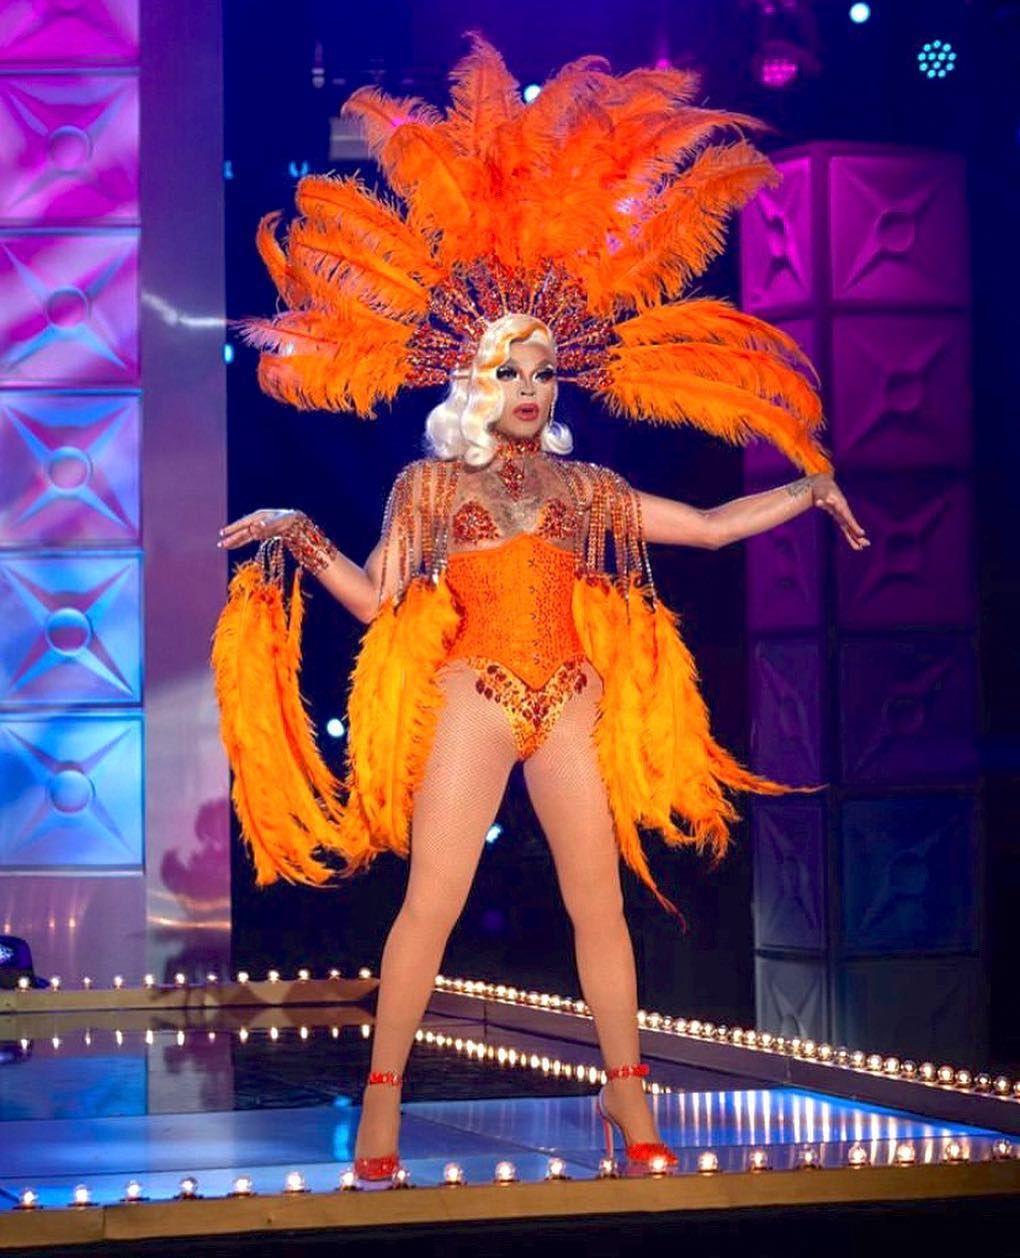 Art Faithful Da Neena Goddess Drag Cabaret Showgirl Peagent Dance Headdress